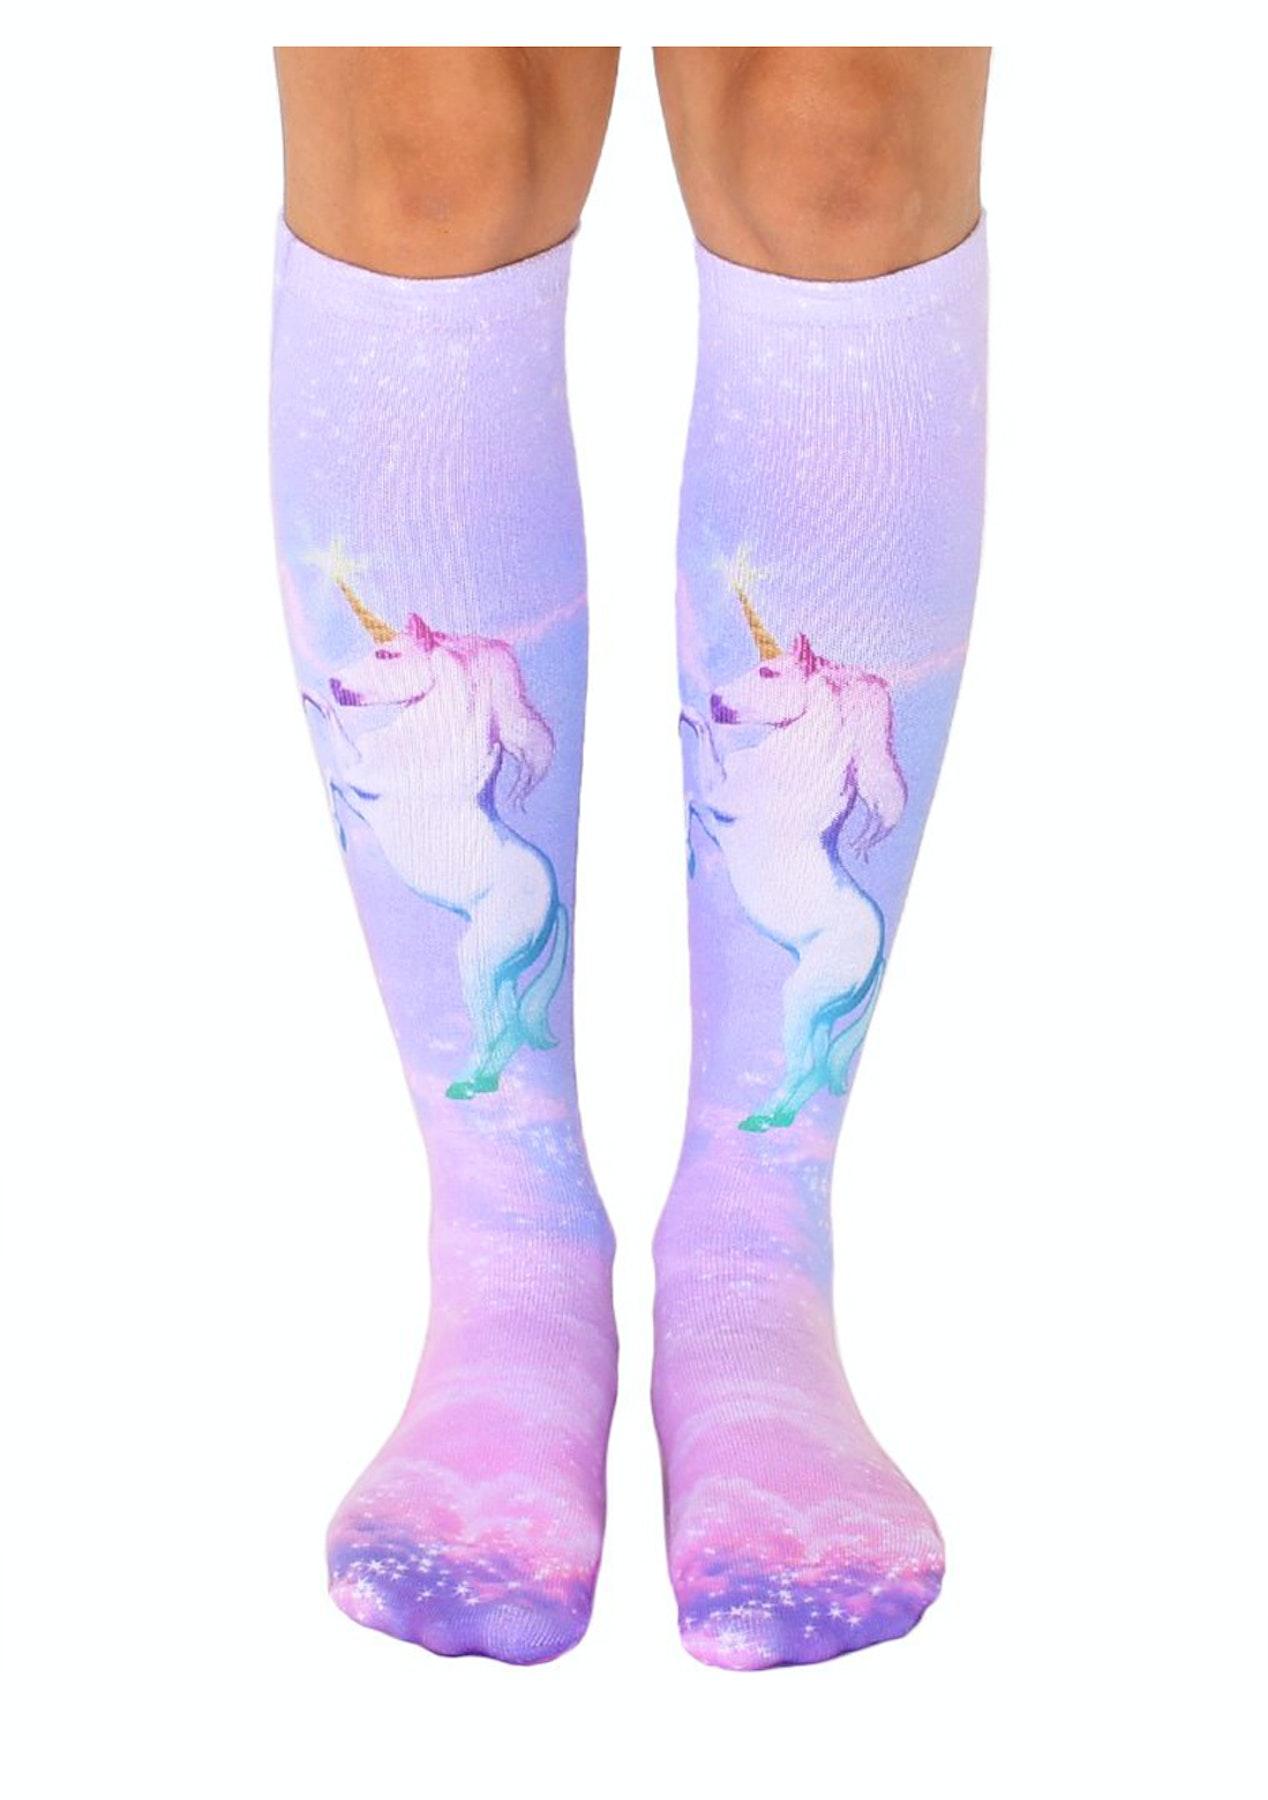 3fe21785fa2 Living Royal Socks - Unicorn Dreams Knee High Socks - The Big Kids Christmas  Gift Sale - Onceit